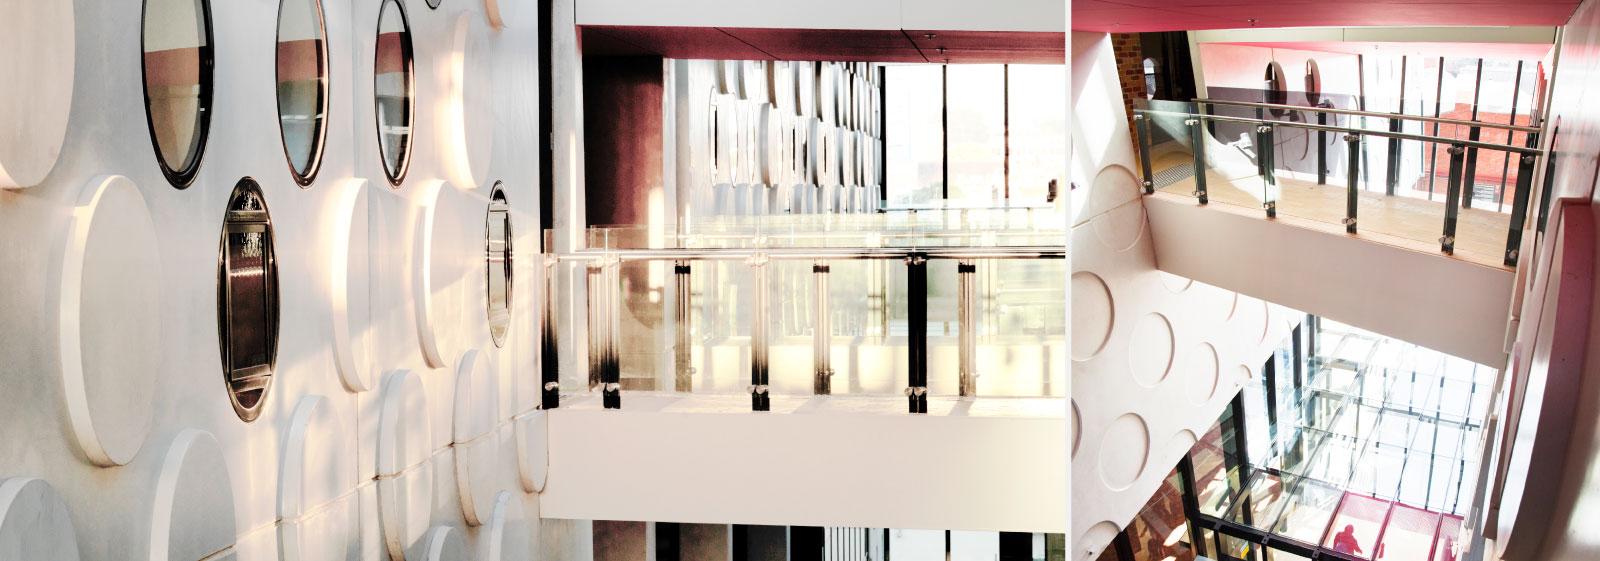 H2o-Architects-Melbourne-Swinburne-ATC-5